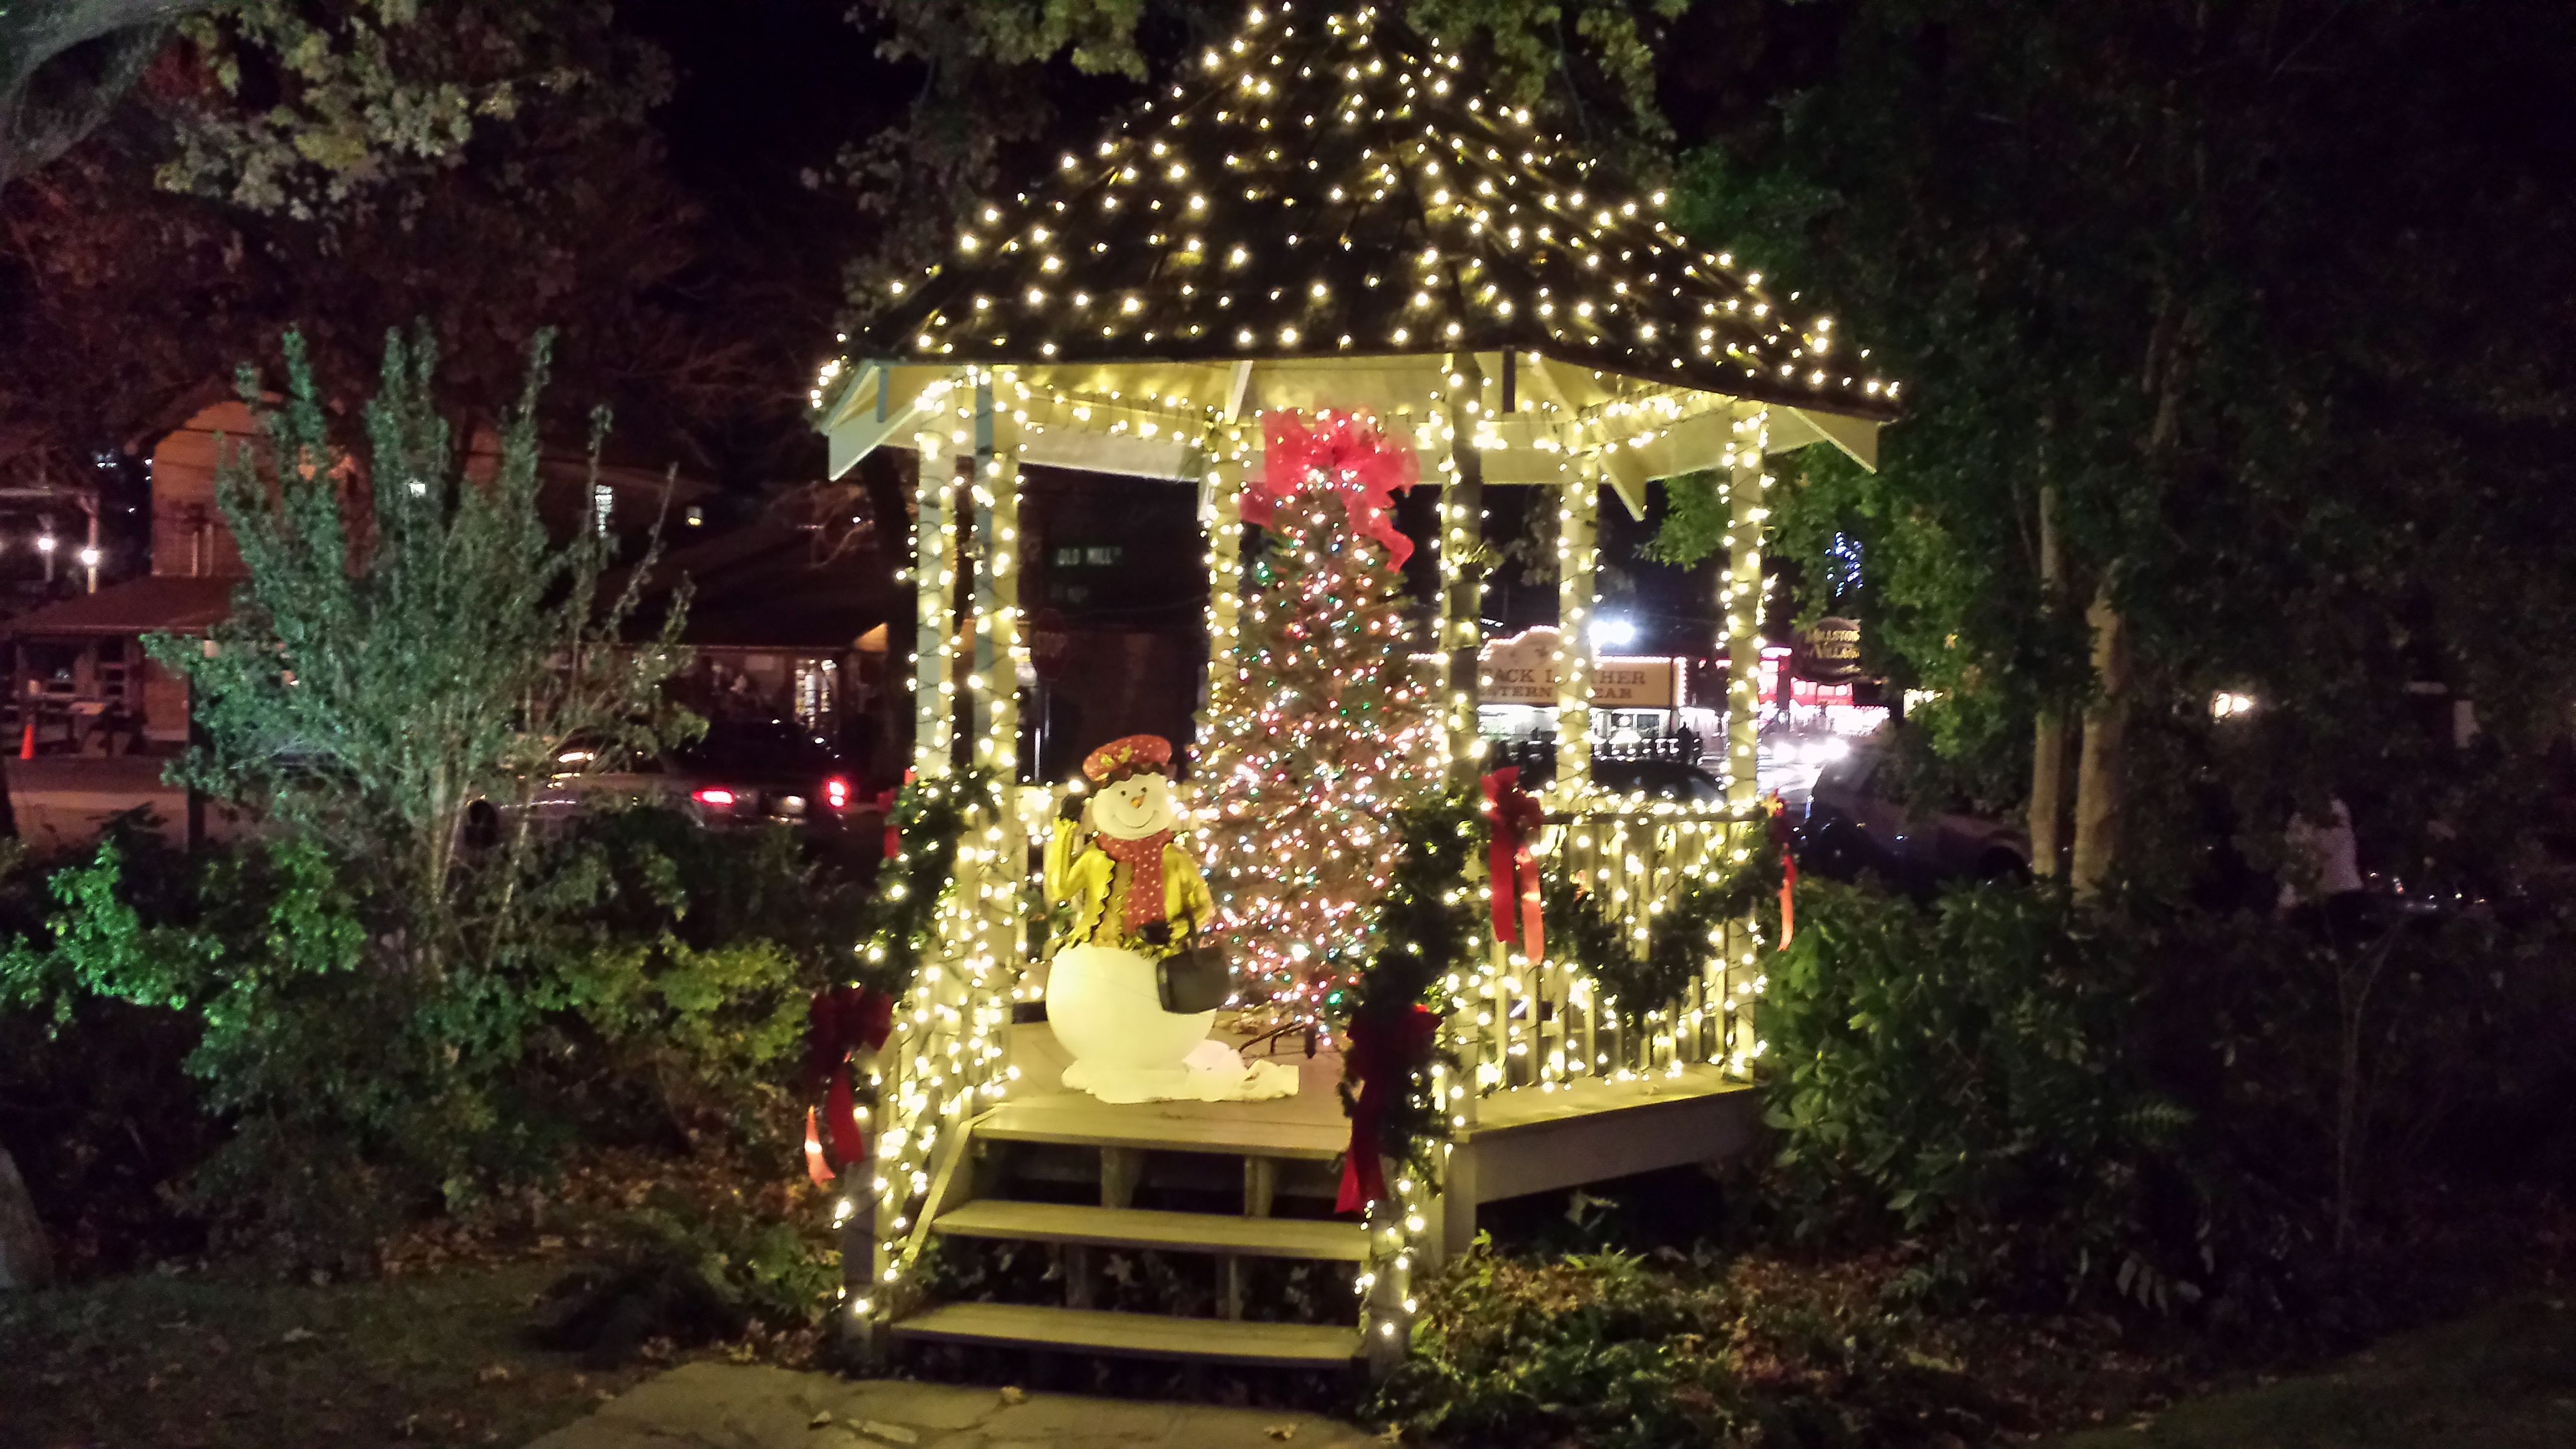 Photos Of Gatlinburg The Great Smoky Mountains Elk Springs Resort Gatlinburg Christmas Xmas Lights Gatlinburg